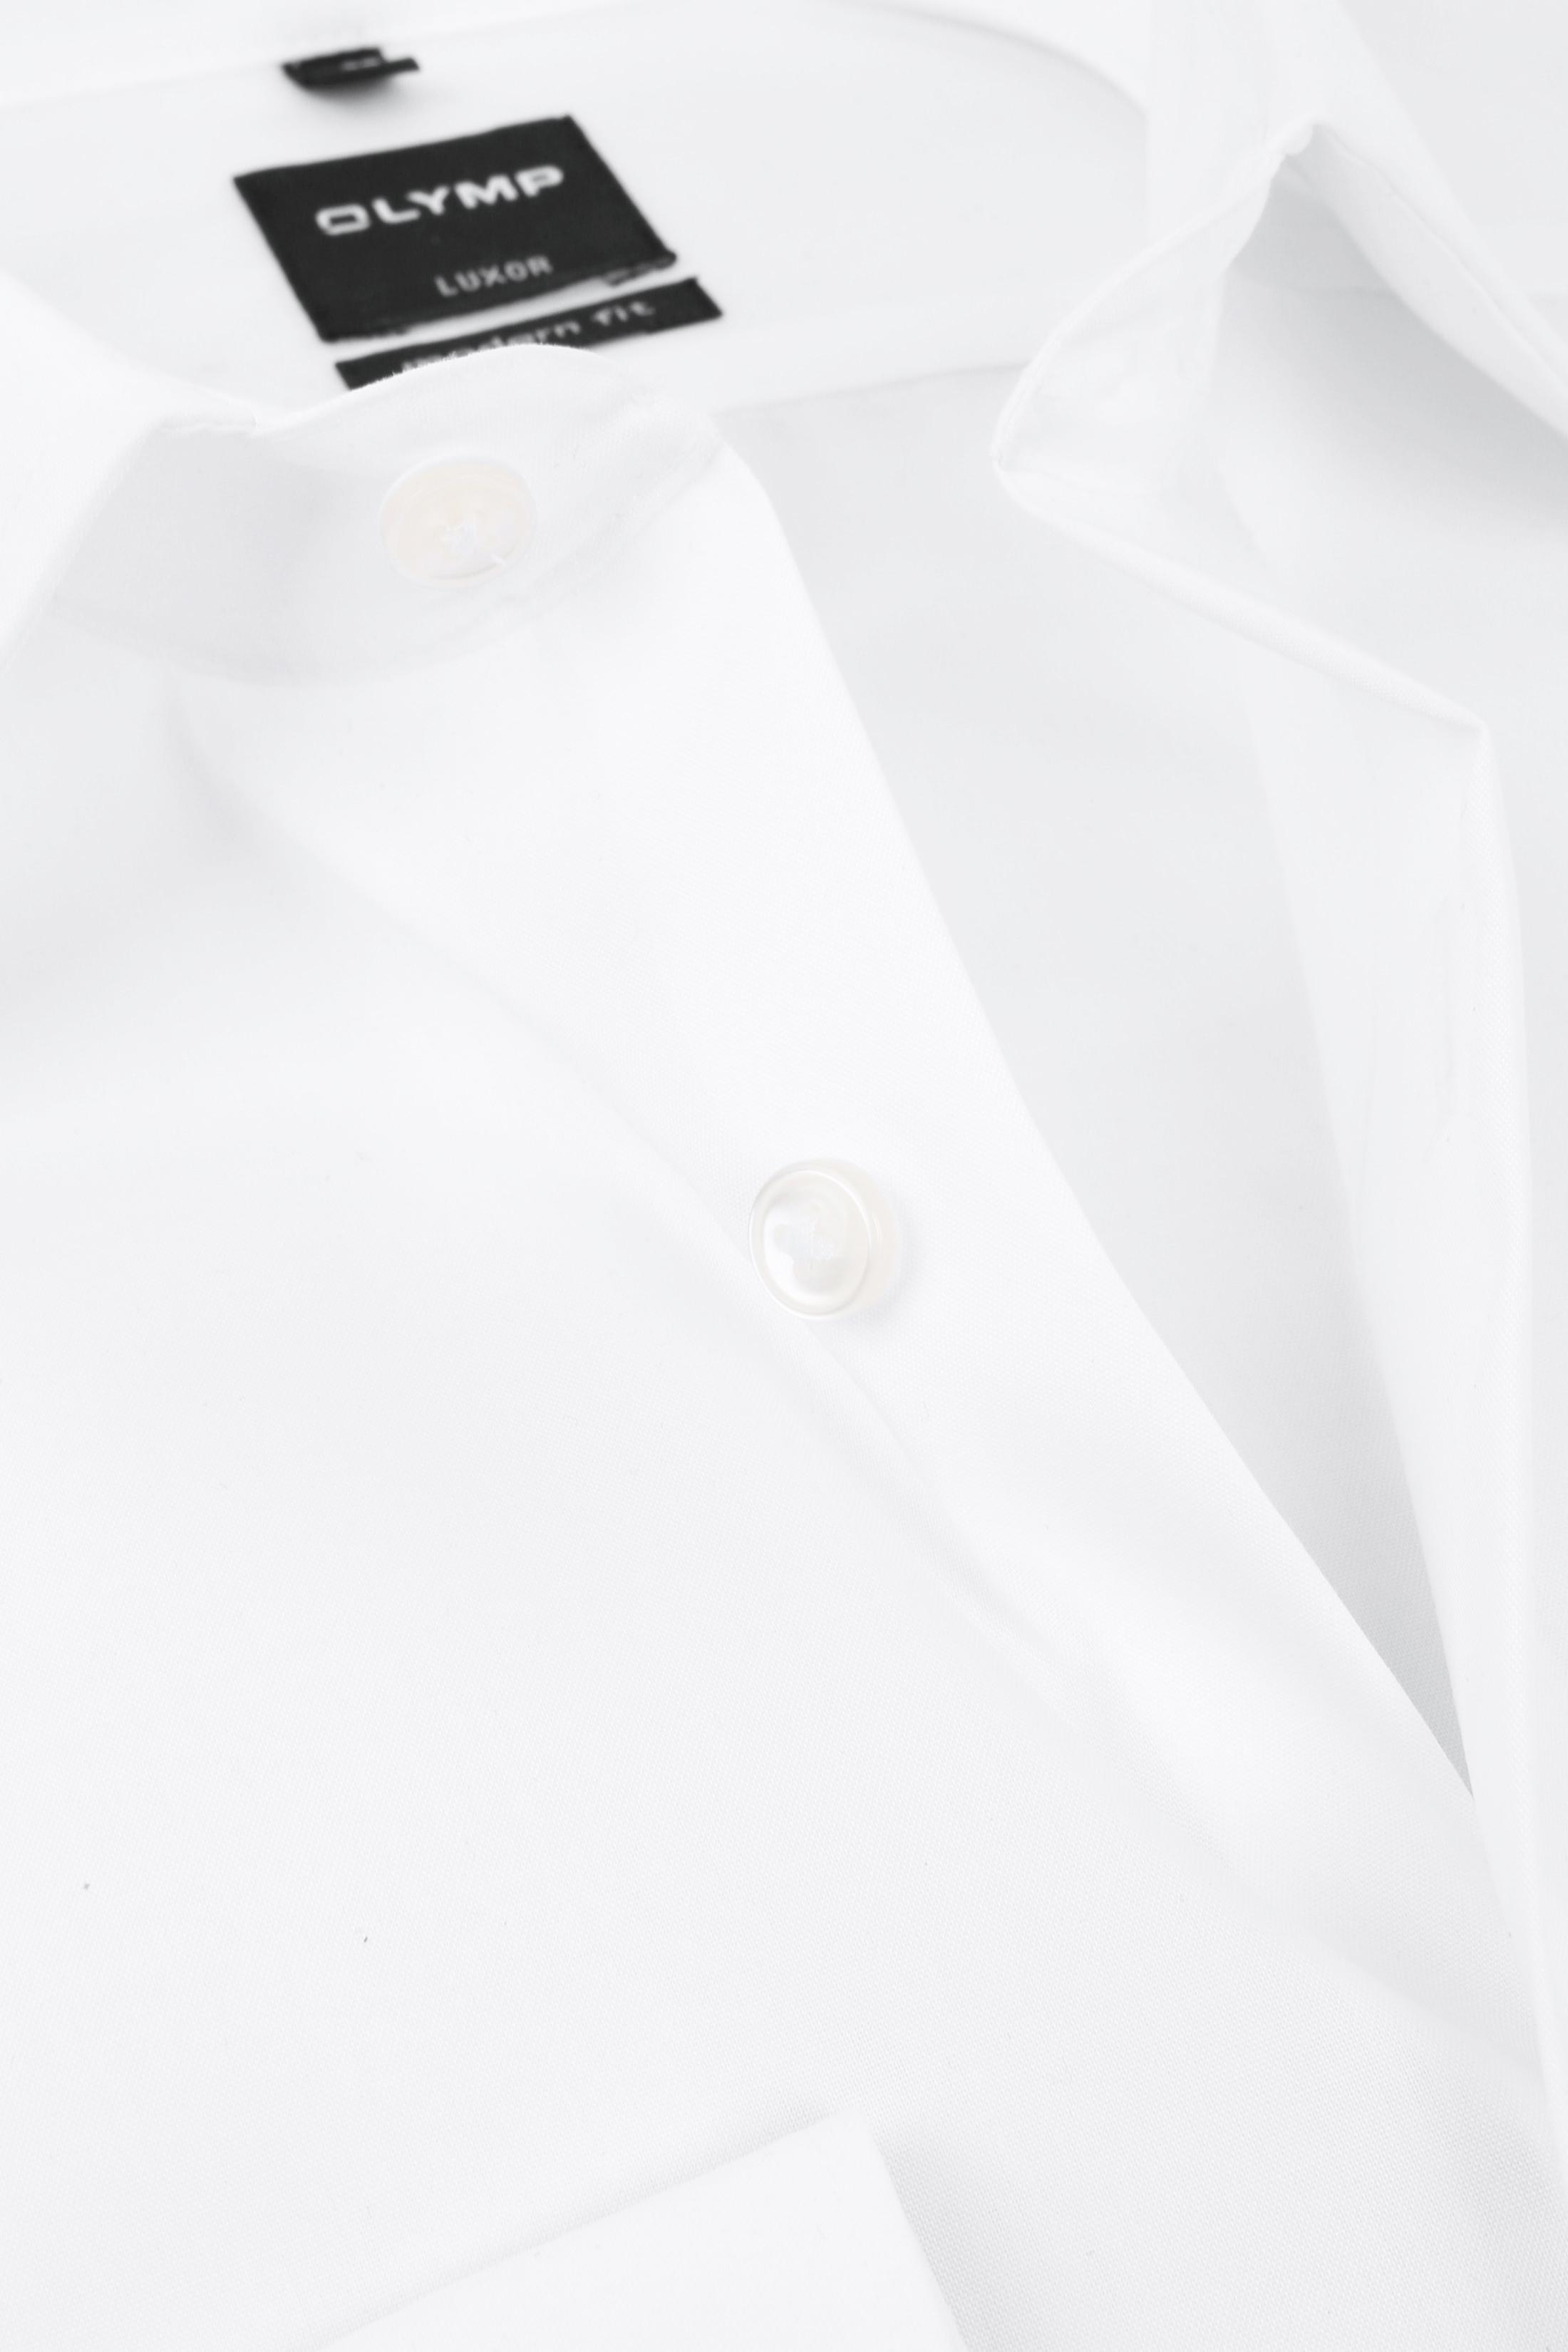 OLYMP Luxor SL7 Overhemd Modern Fit Wit foto 1